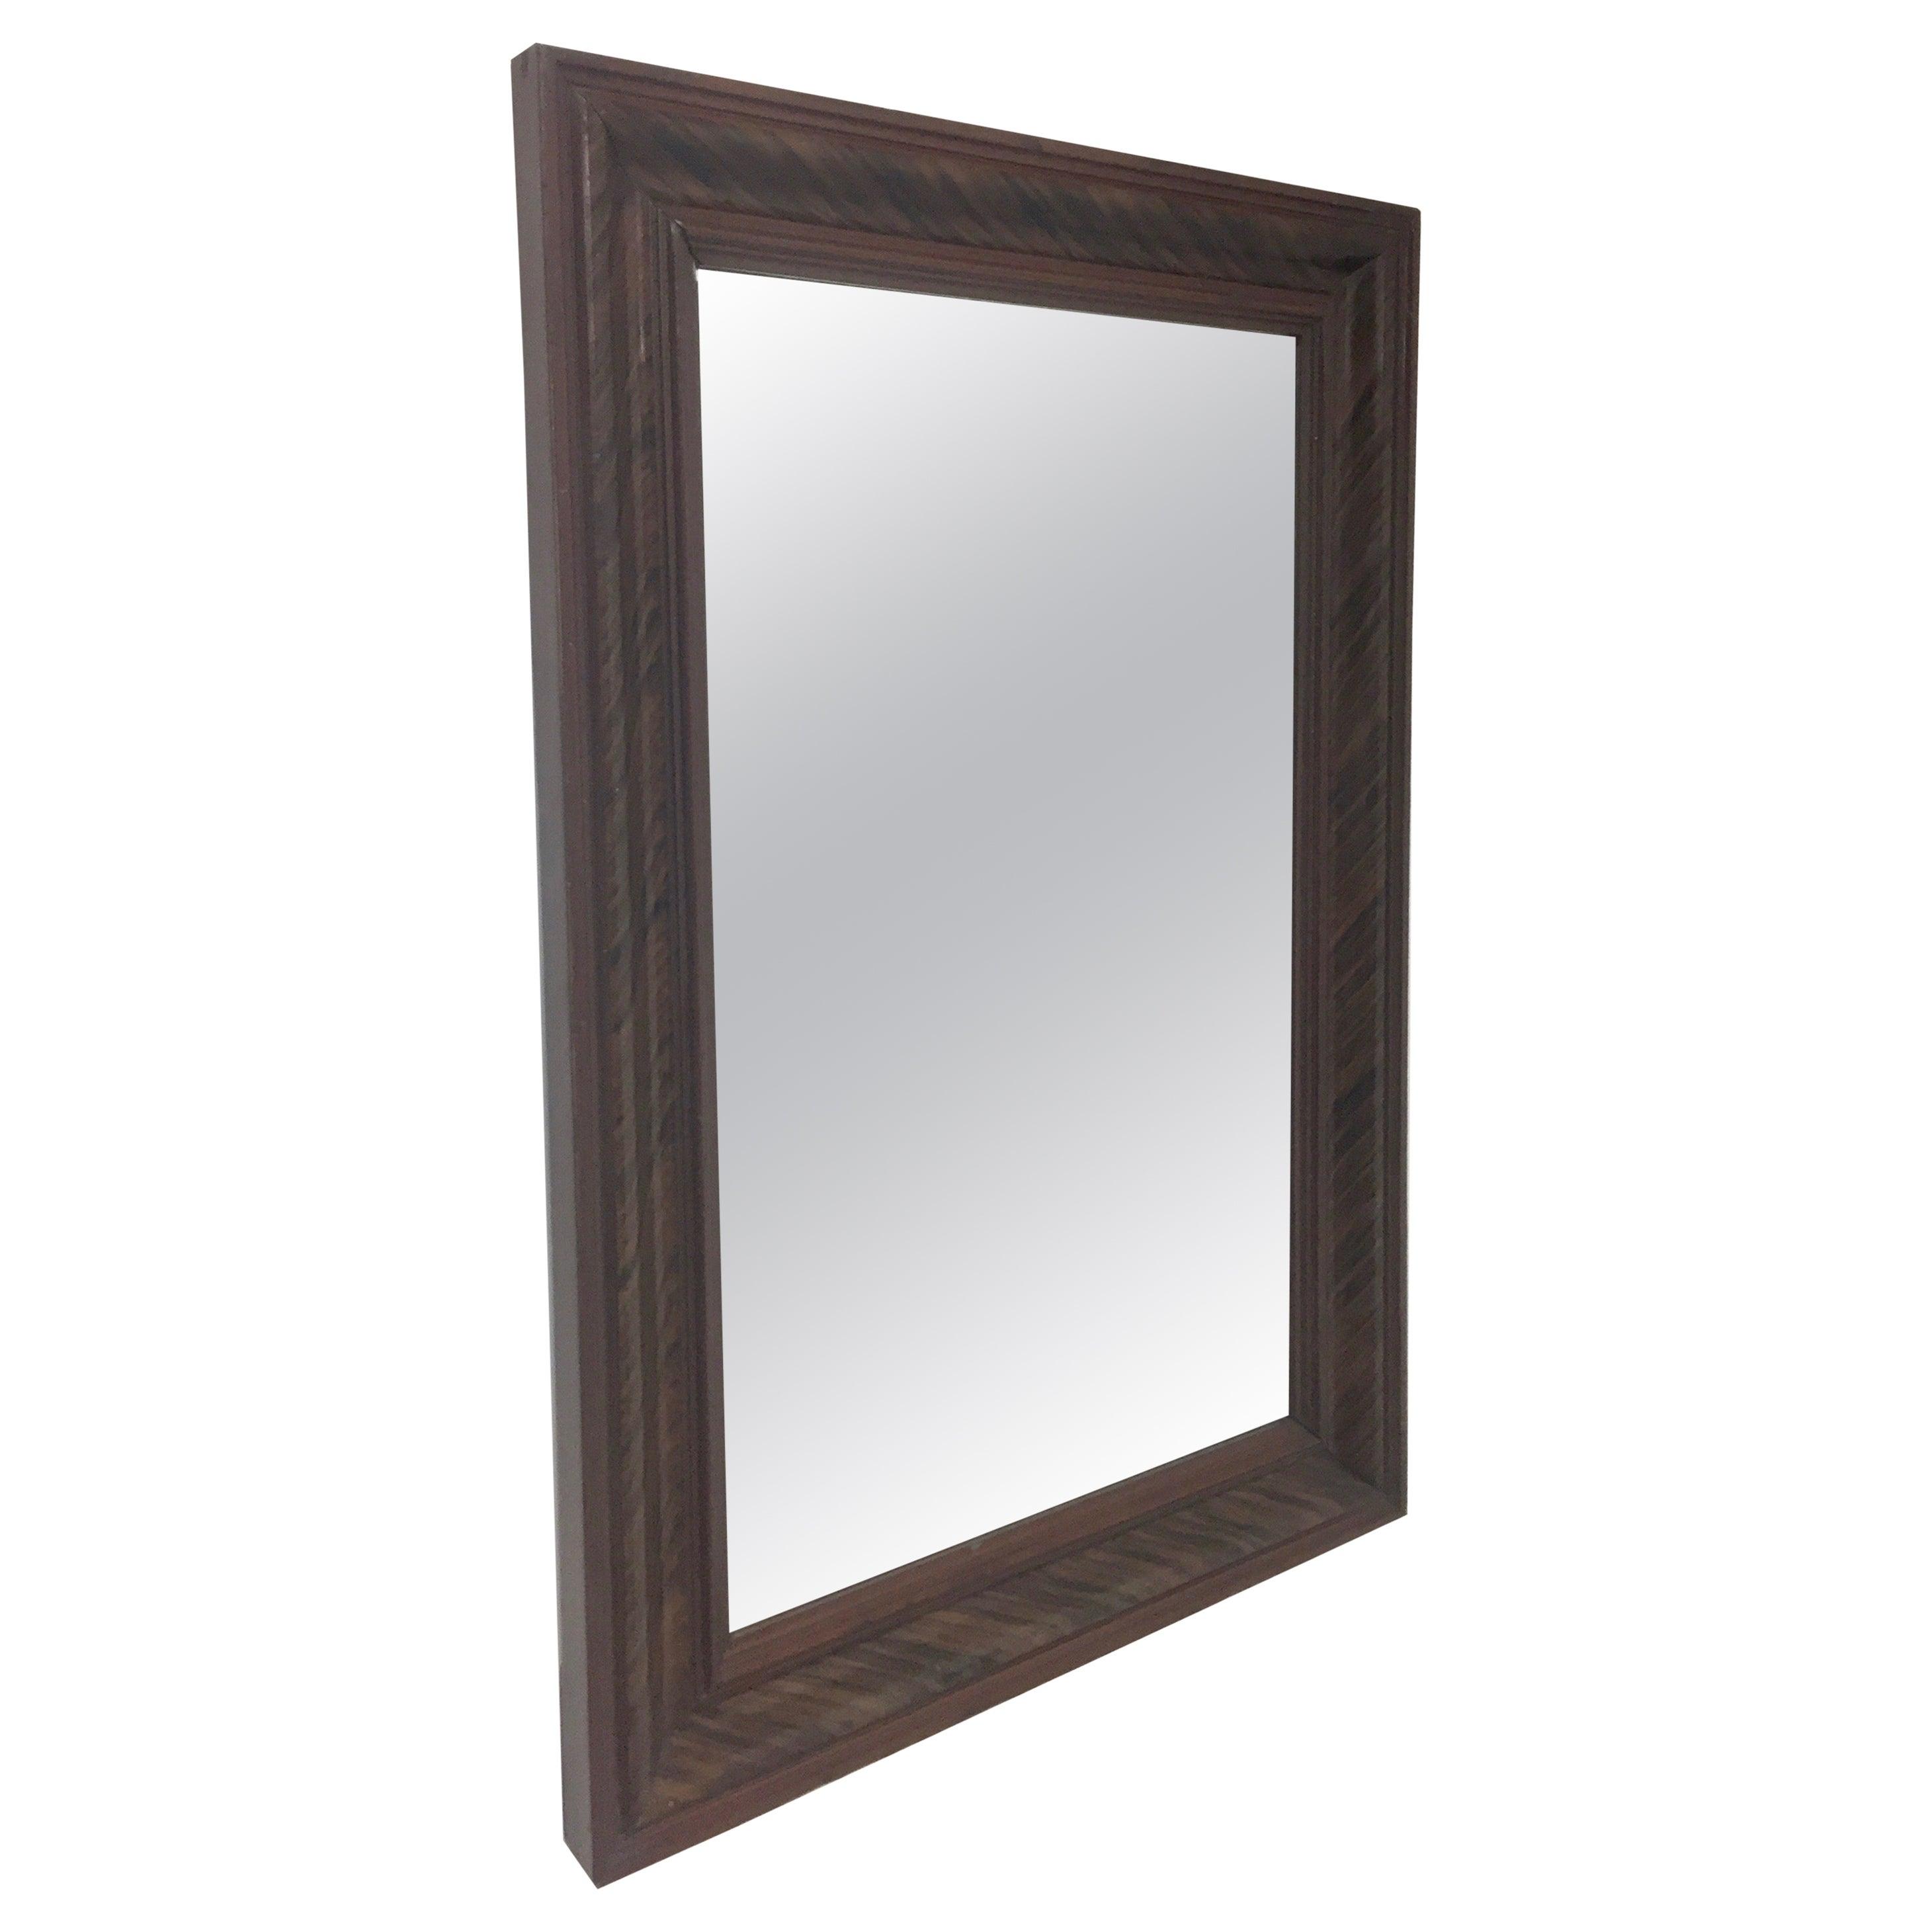 Pine Grain Painted Wall Mirror